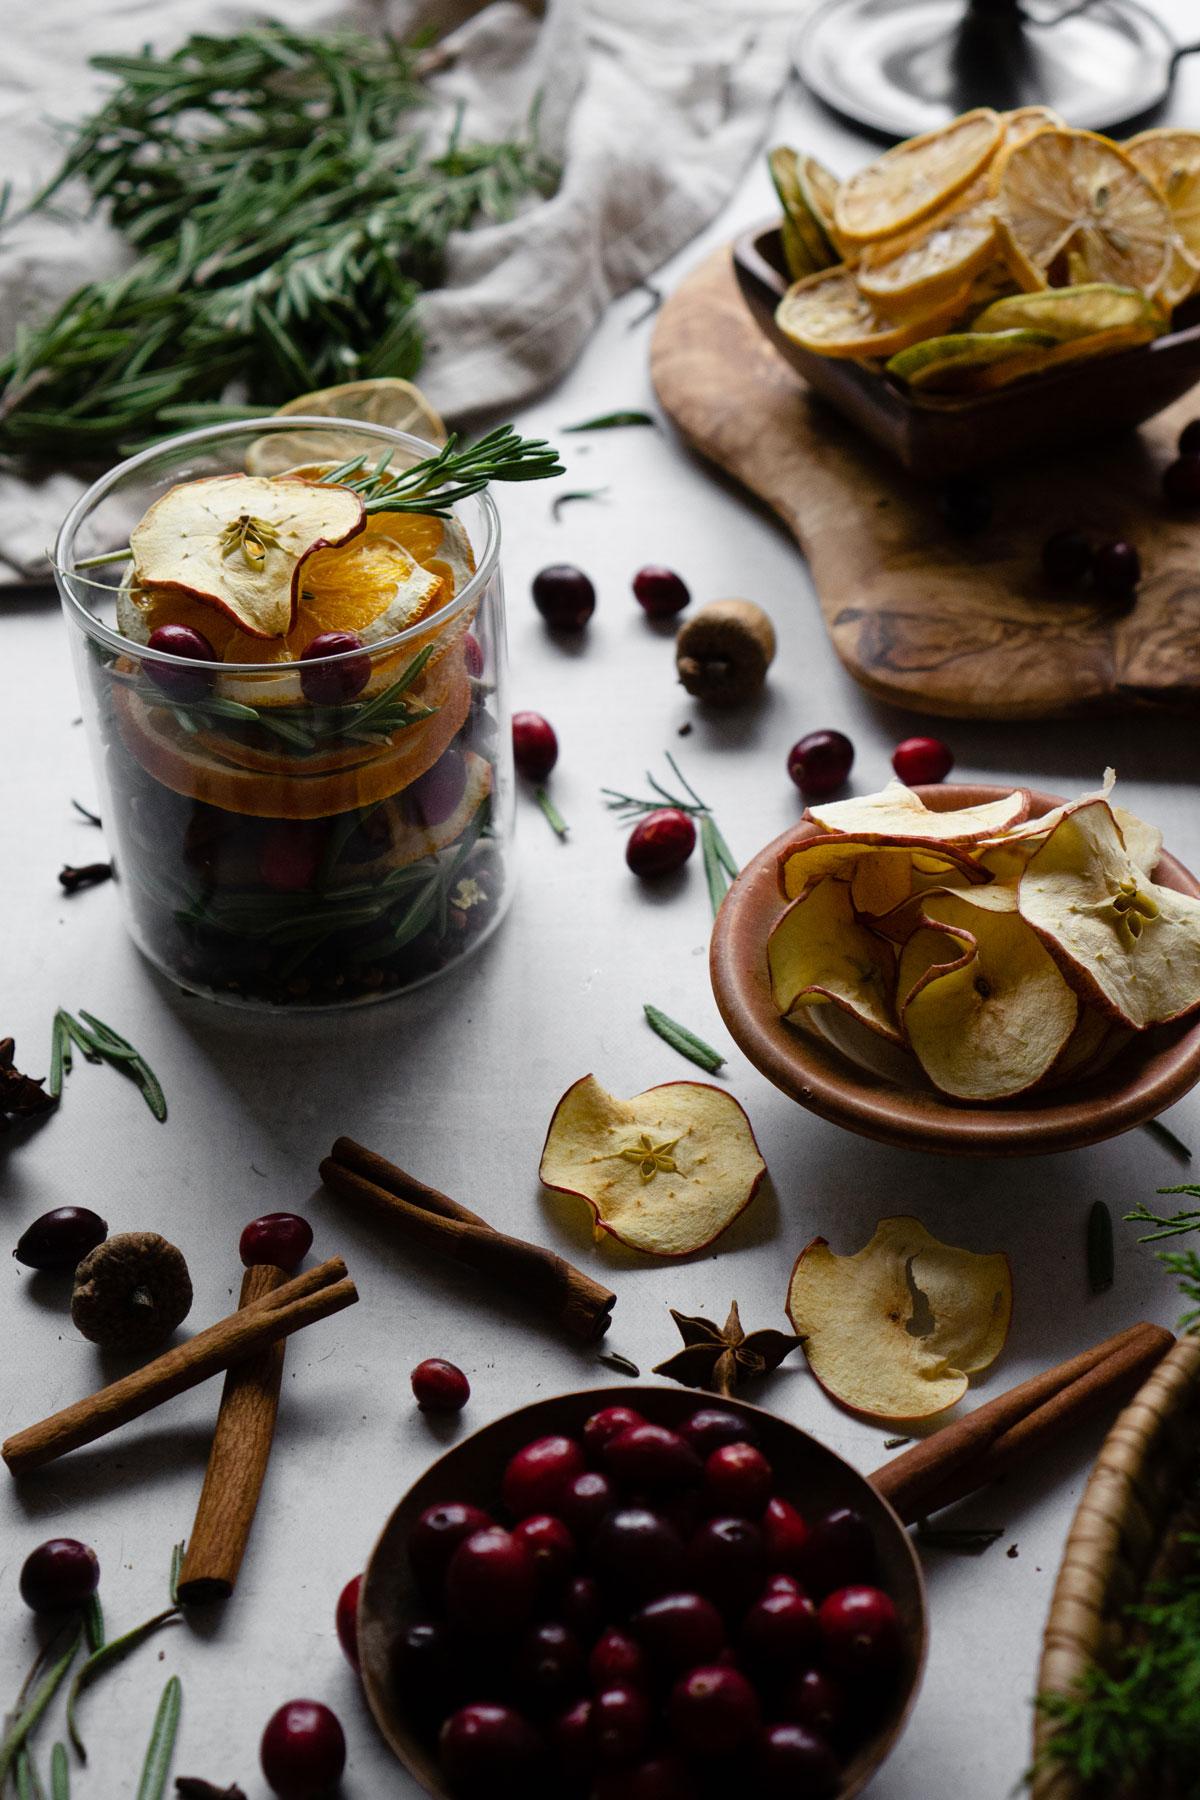 3 stovetop potpourri recipes